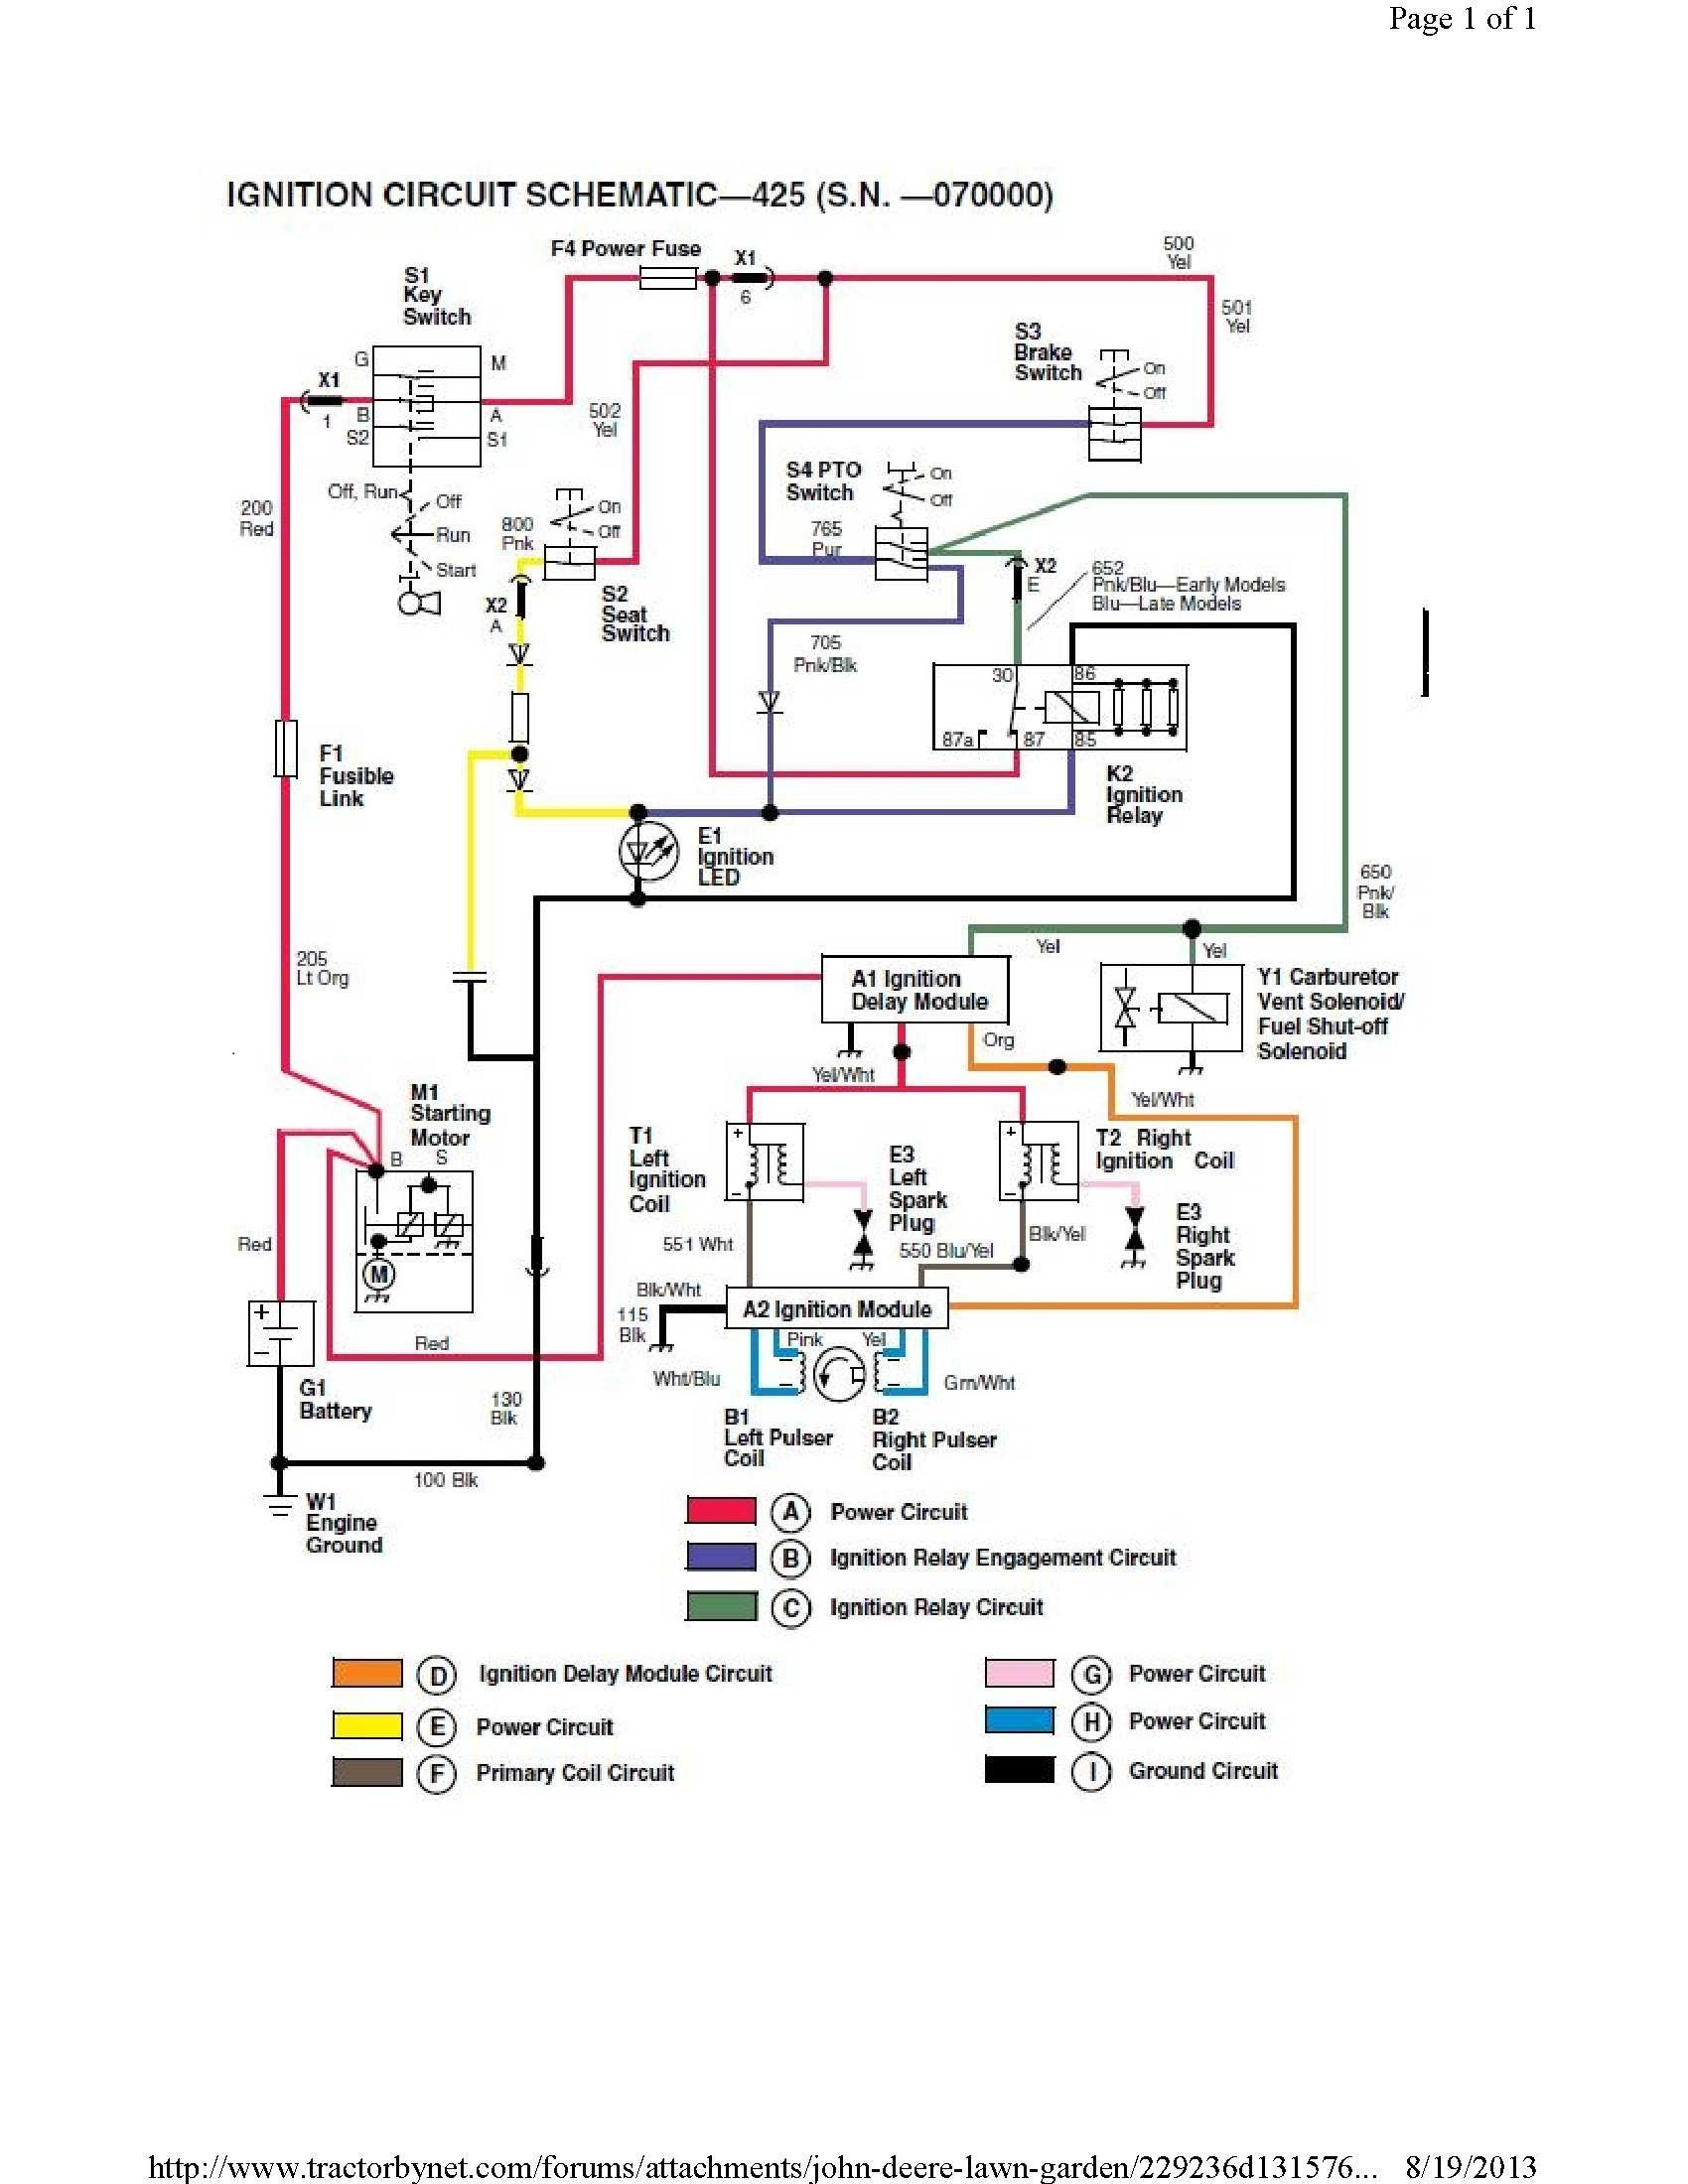 John Deere 318 Pto Switch Wiring Trusted Schematics Diagram. John Deere L120 Wiring Diagram 425 Pto 318. John Deere. John Deere L130 Pto Clutch Diagram At Scoala.co